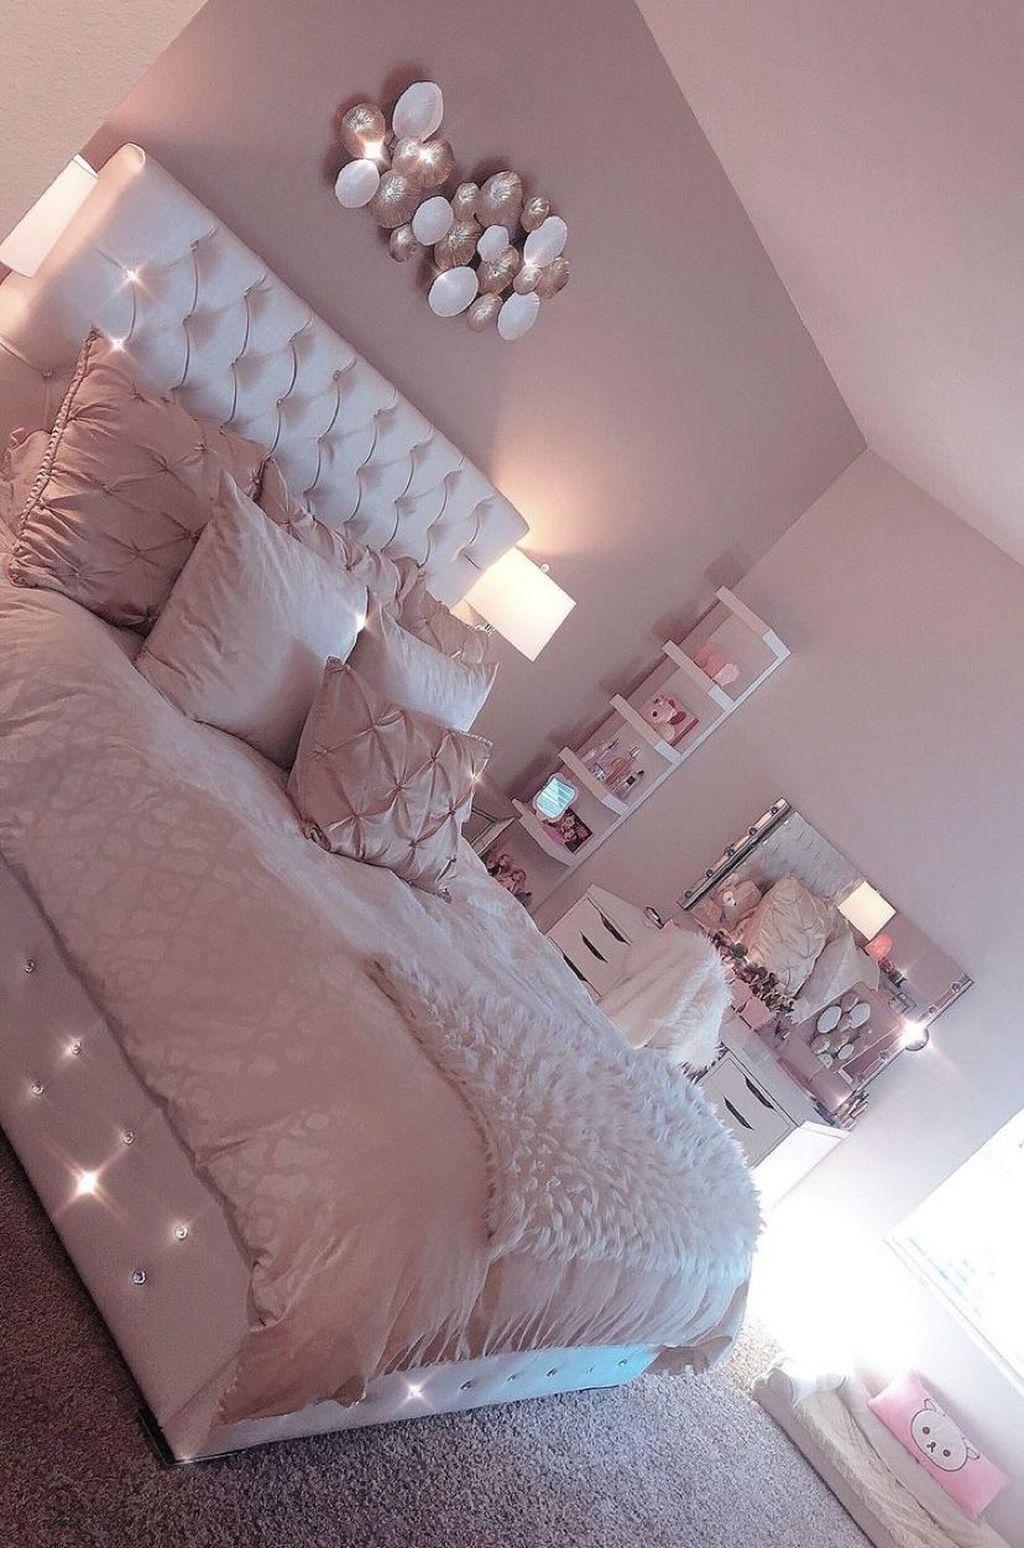 30 Vintage Pink Bedroom Designs Ideas That Are Dream Of Every Girl Pink Bedroom Design Pink Room Decor Girl Bedroom Decor